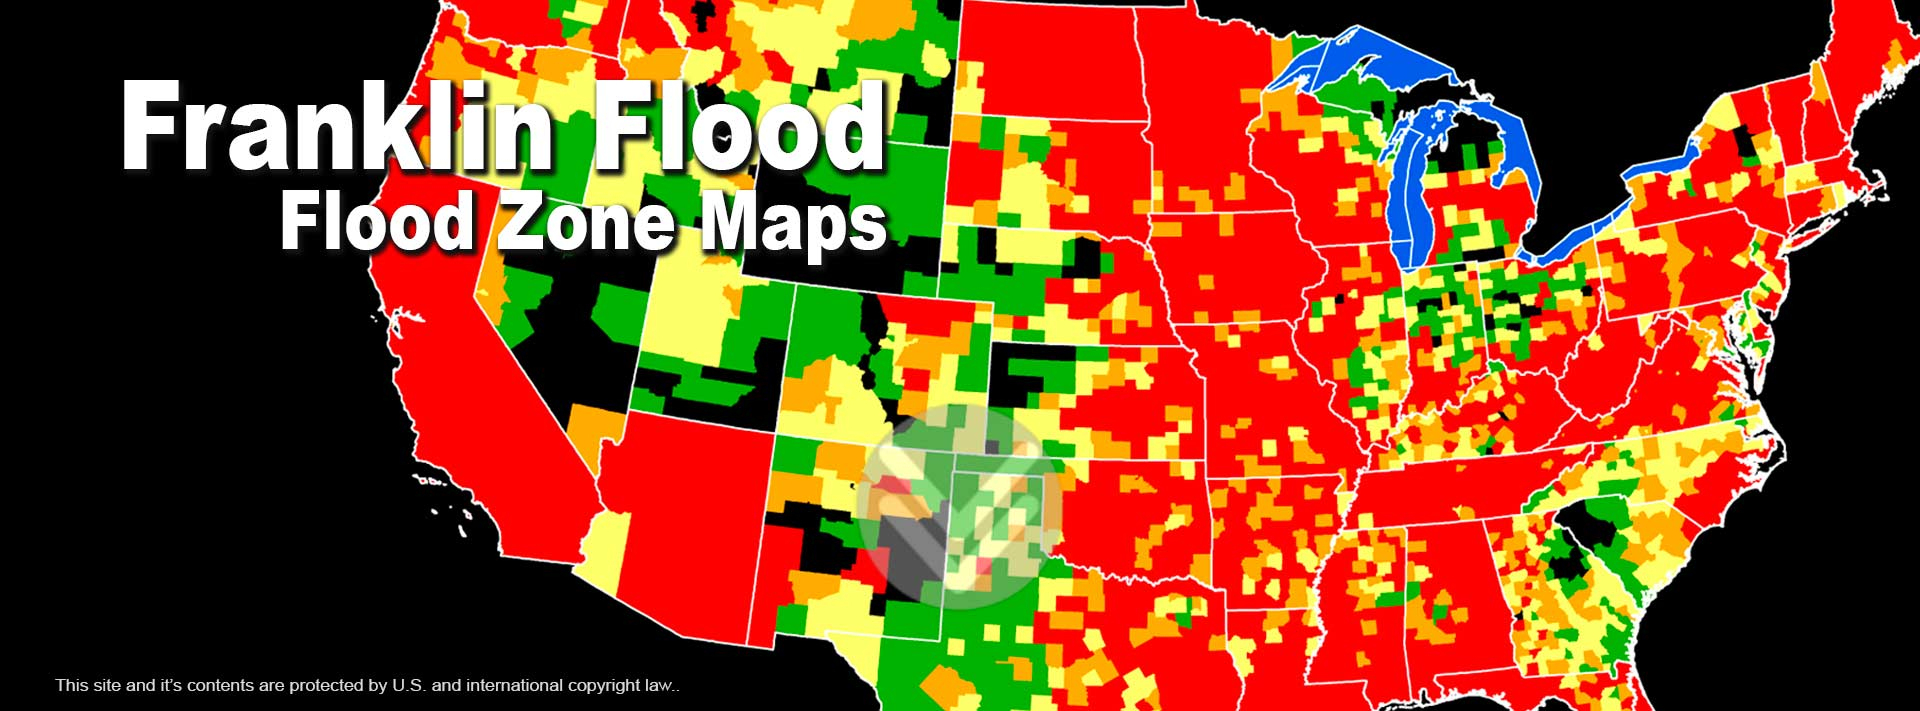 Flood Zone Rate Maps Explained - Flood Zone Map South Florida